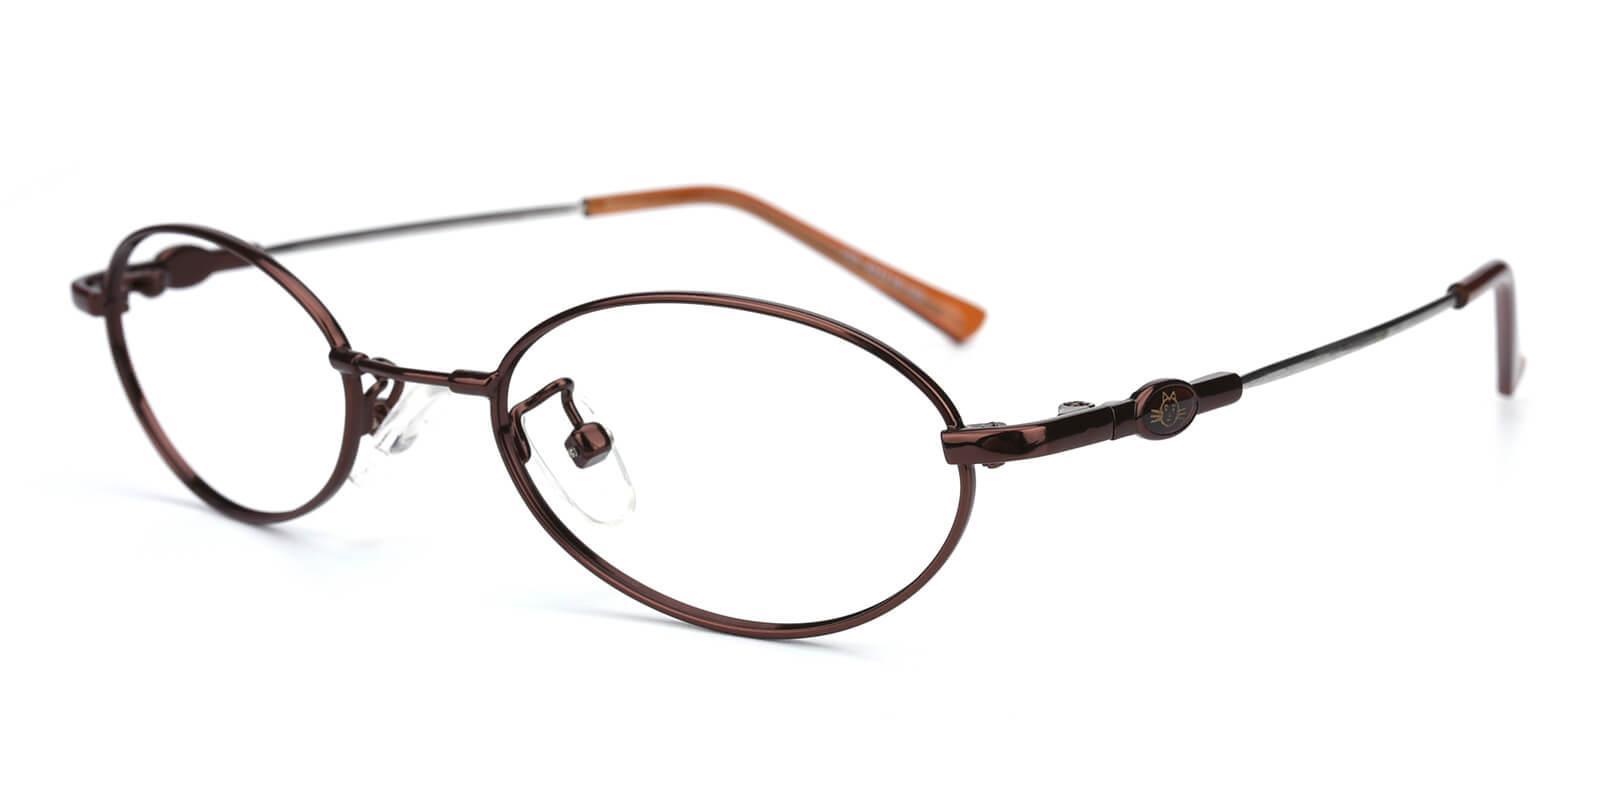 Kola-Brown-Rectangle-Acetate-Eyeglasses-additional1